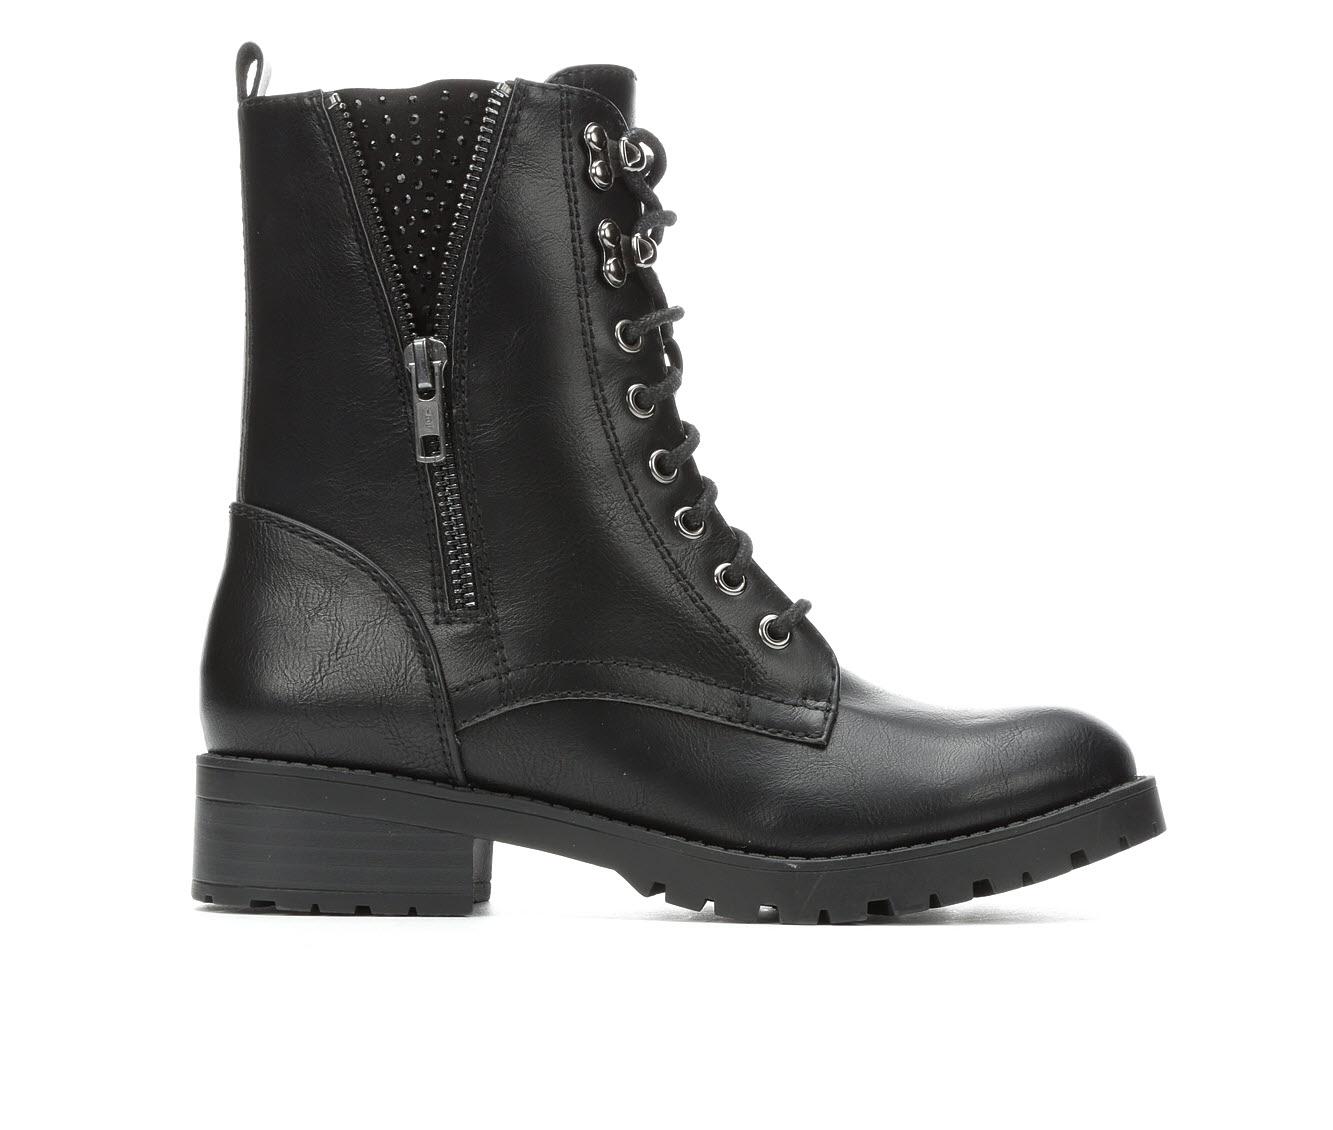 Unr8ed Kit Women's Boot (Black Faux Leather)